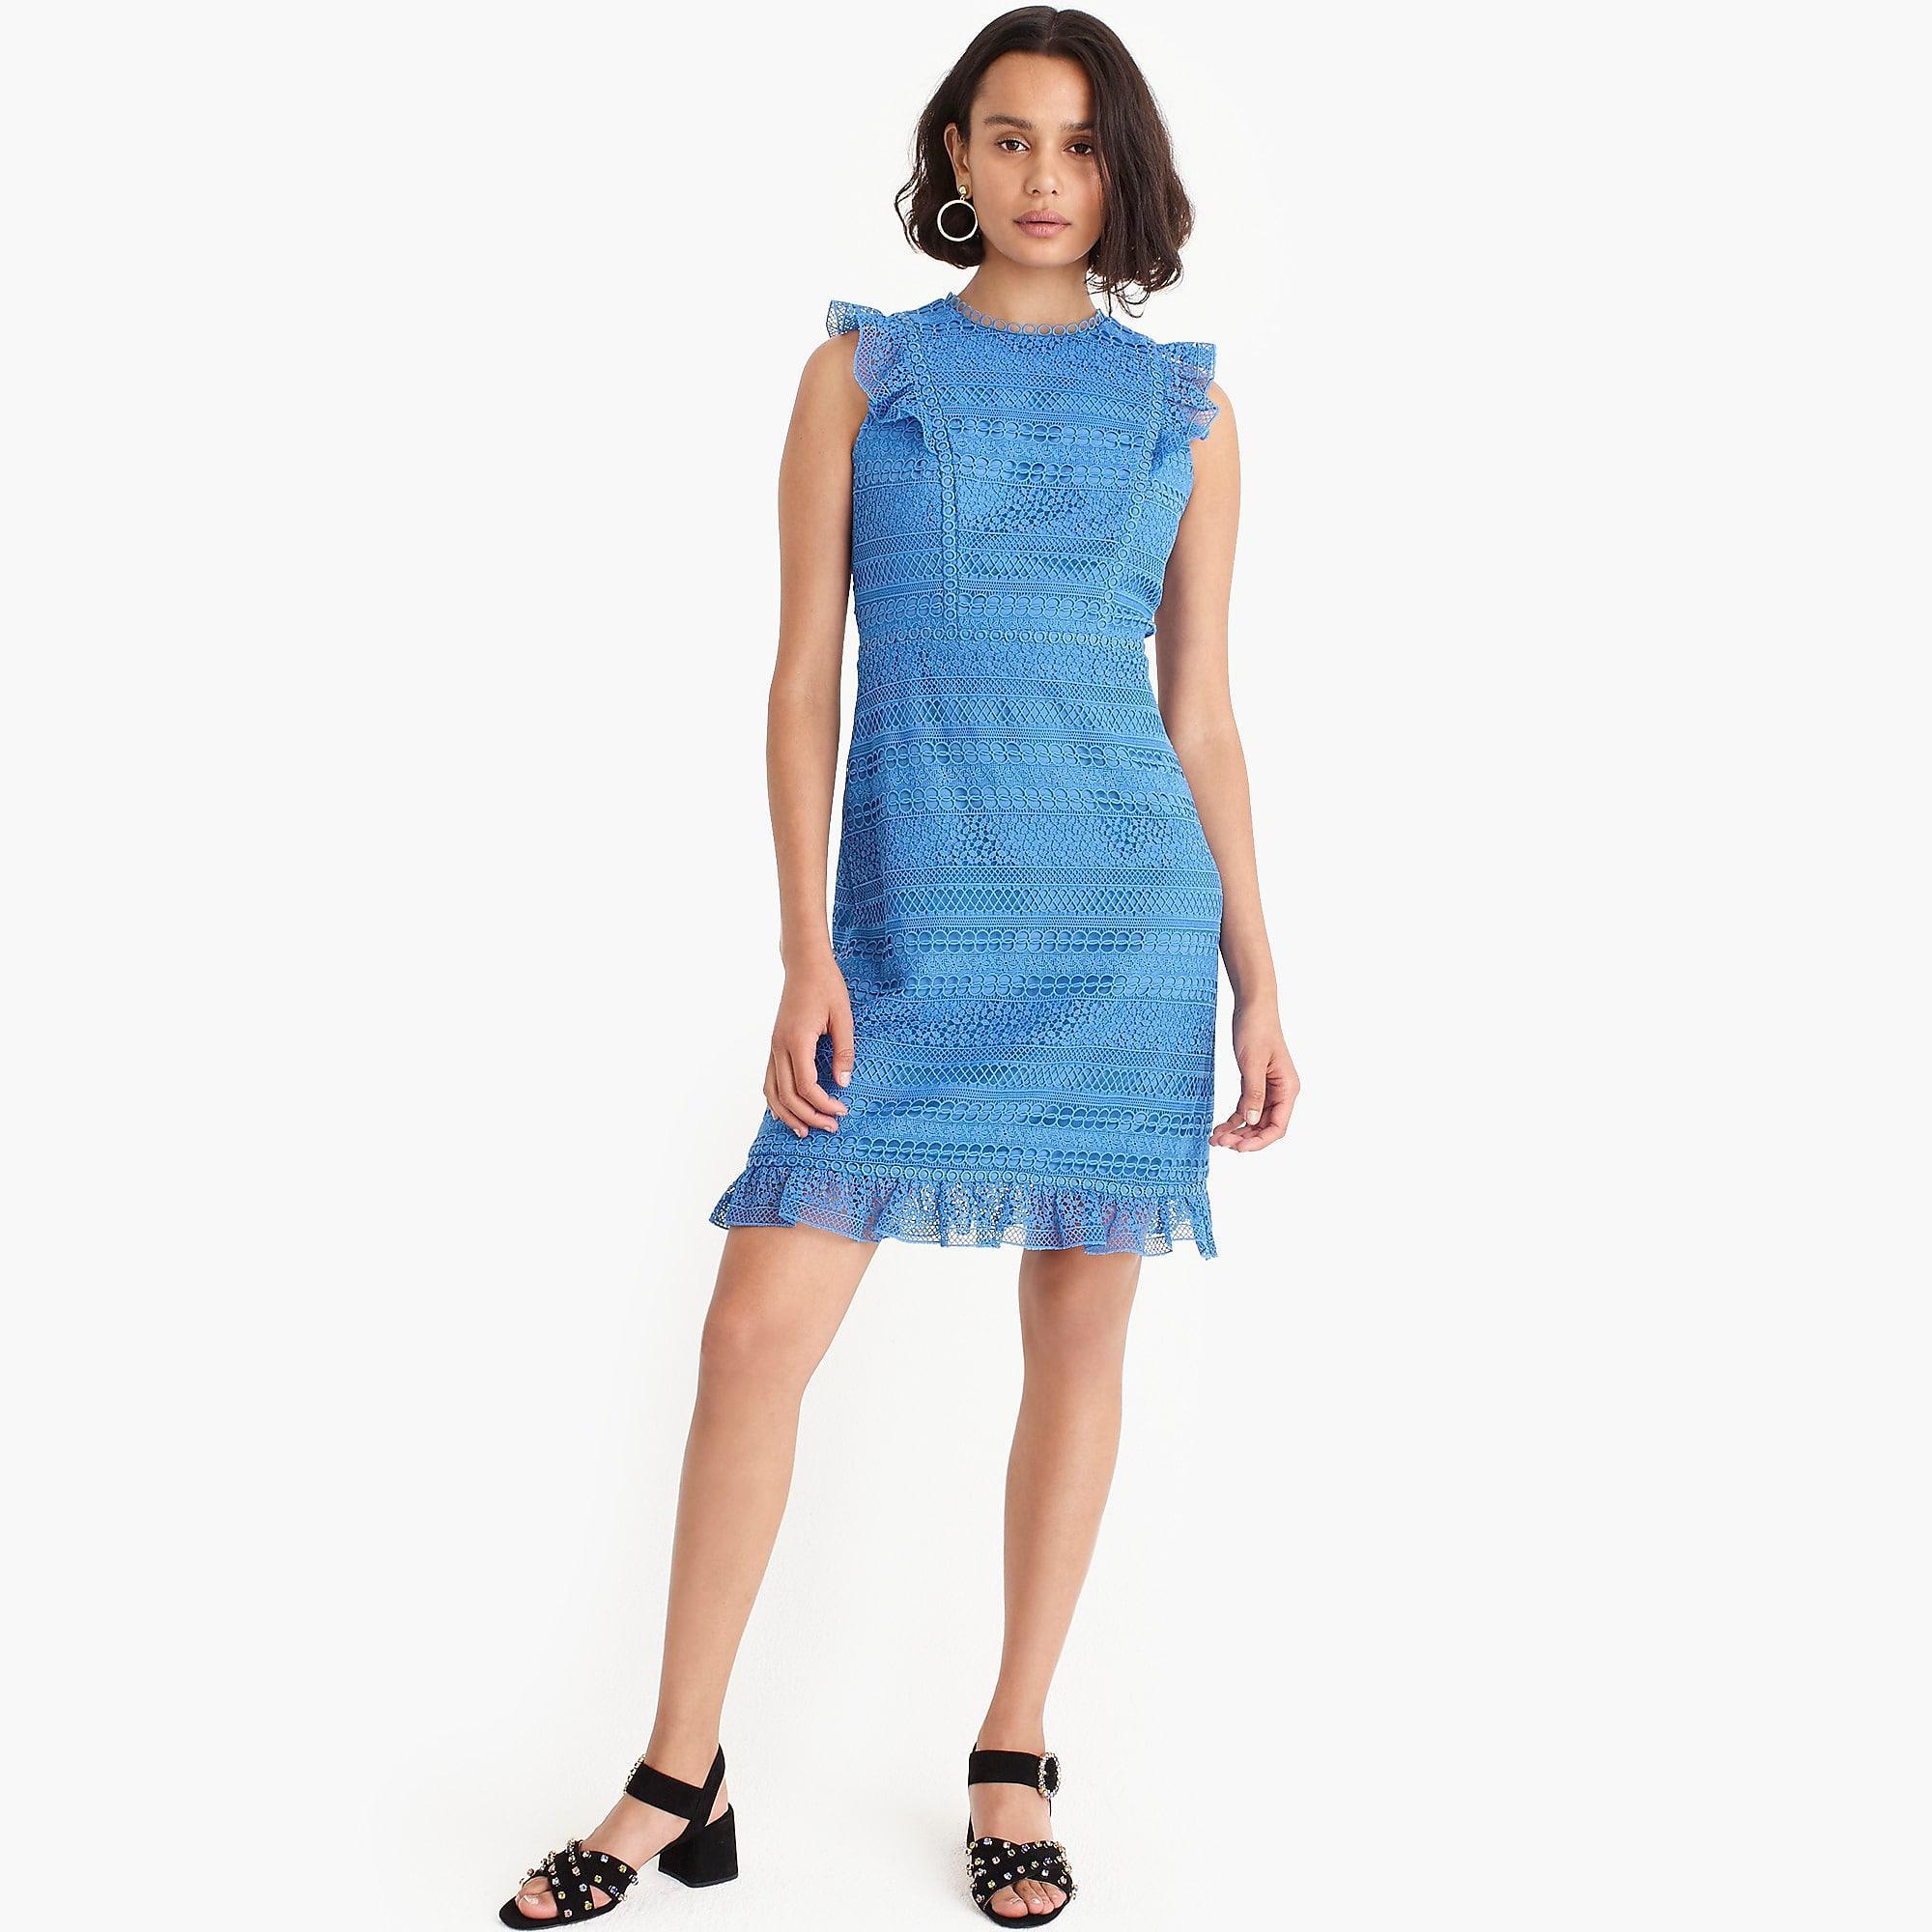 1372871ec98 Lyst - J.Crew Cap-sleeve Ruffle Dress In Mixed Lace in Blue